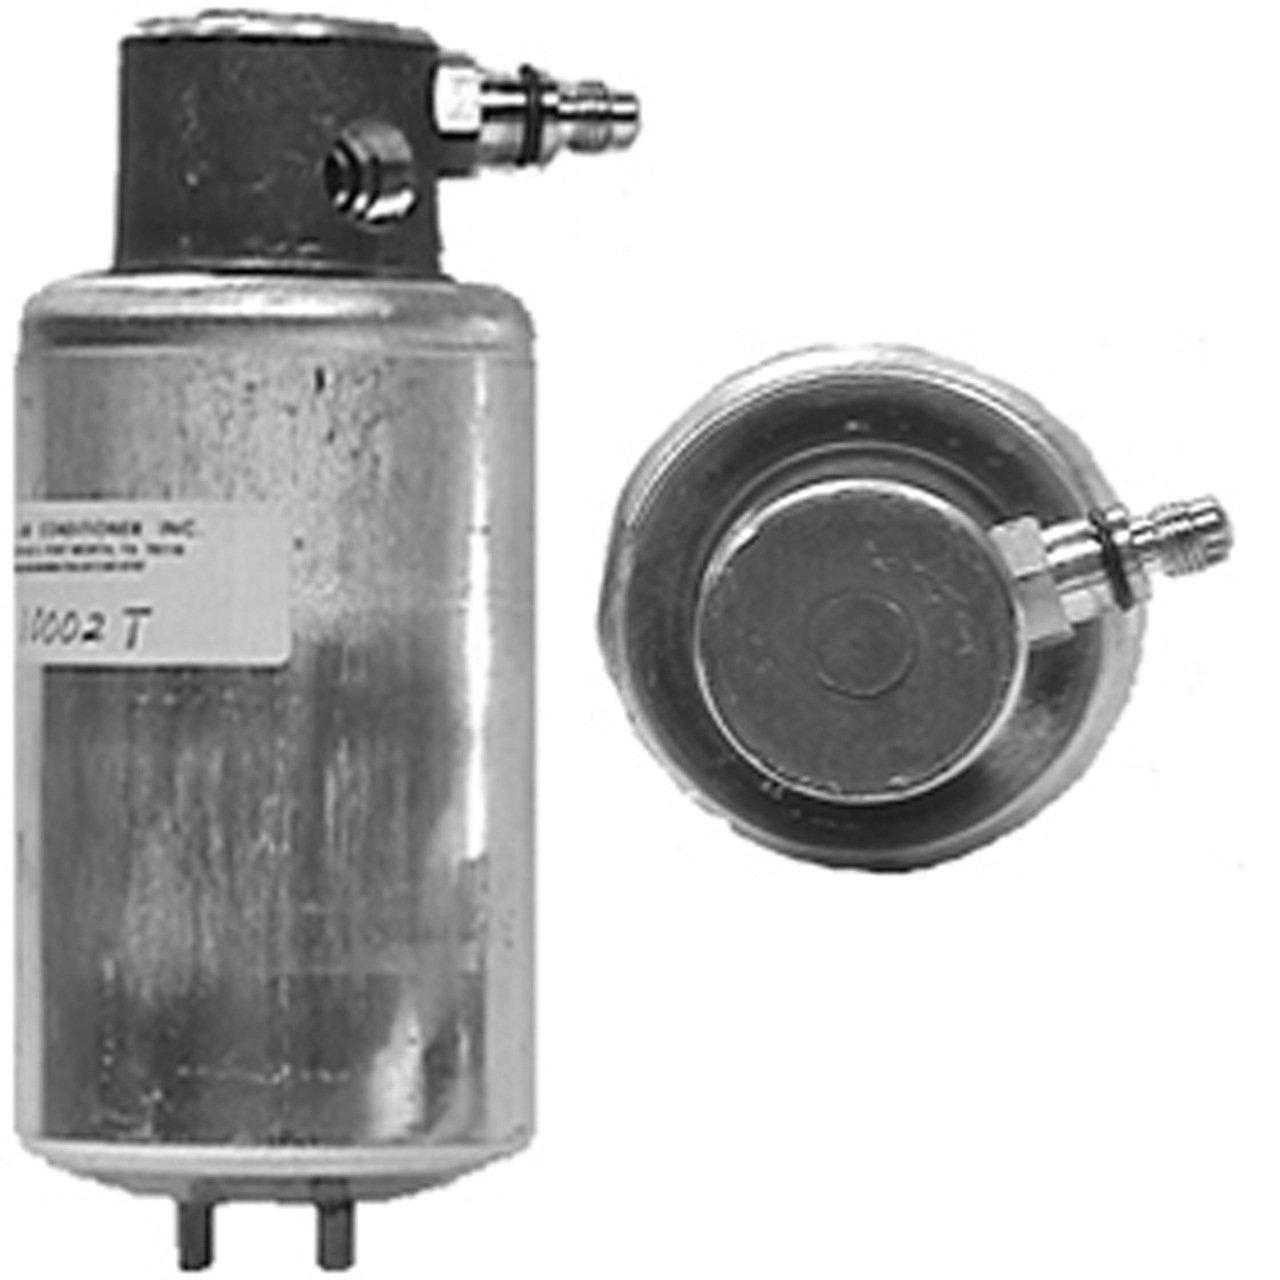 UAC RD 10002C A/C Receiver Drier RD10002C